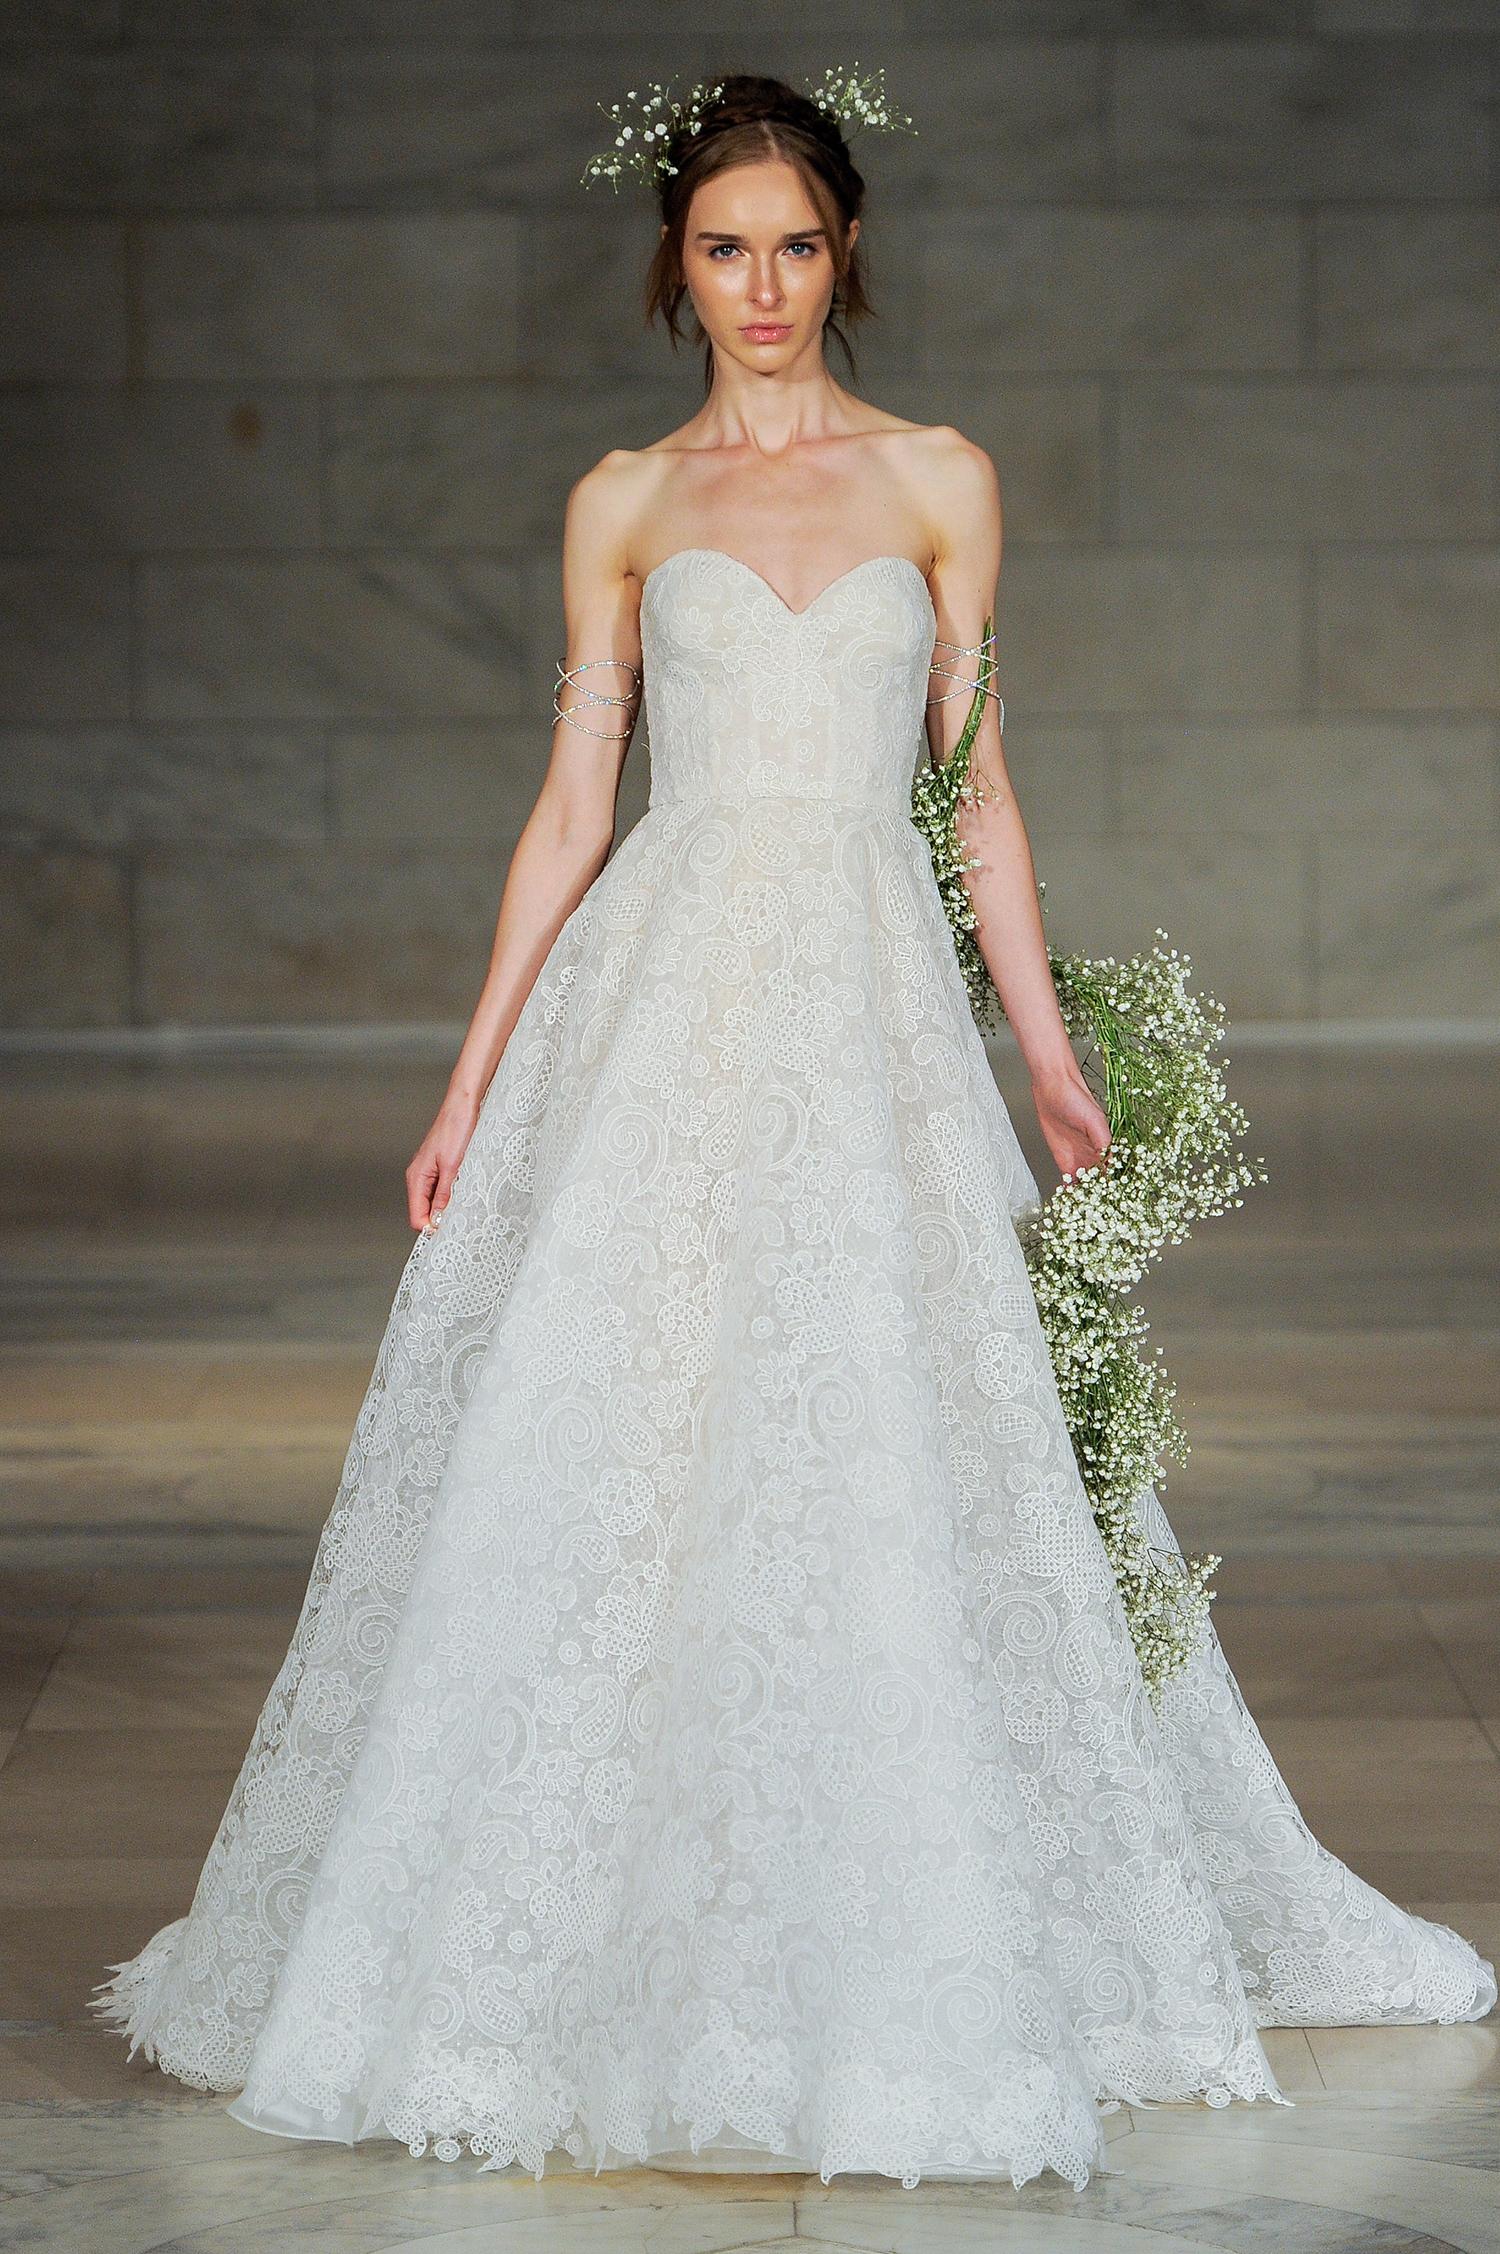 reem acra bridal market wedding dress fall 2018 sweetheart strapless a-line